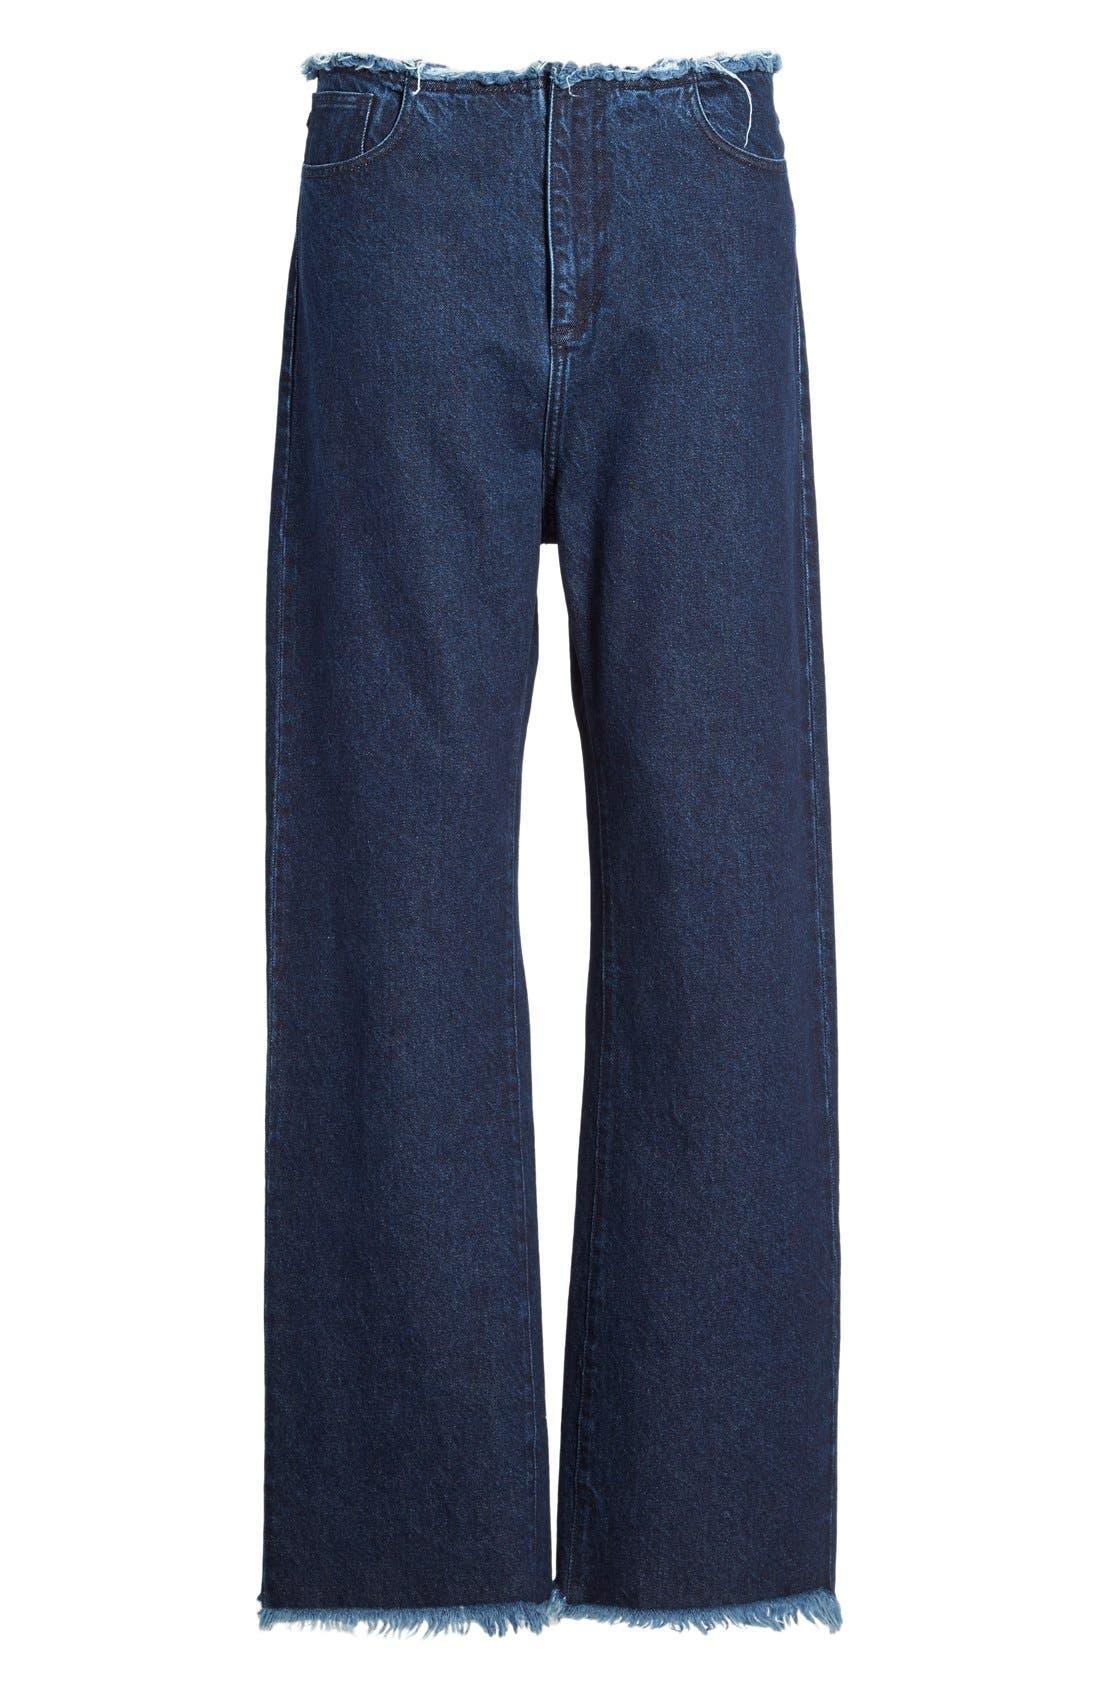 Alternate Image 4  - Marques'Almeida Relaxed Boyfriend Jeans